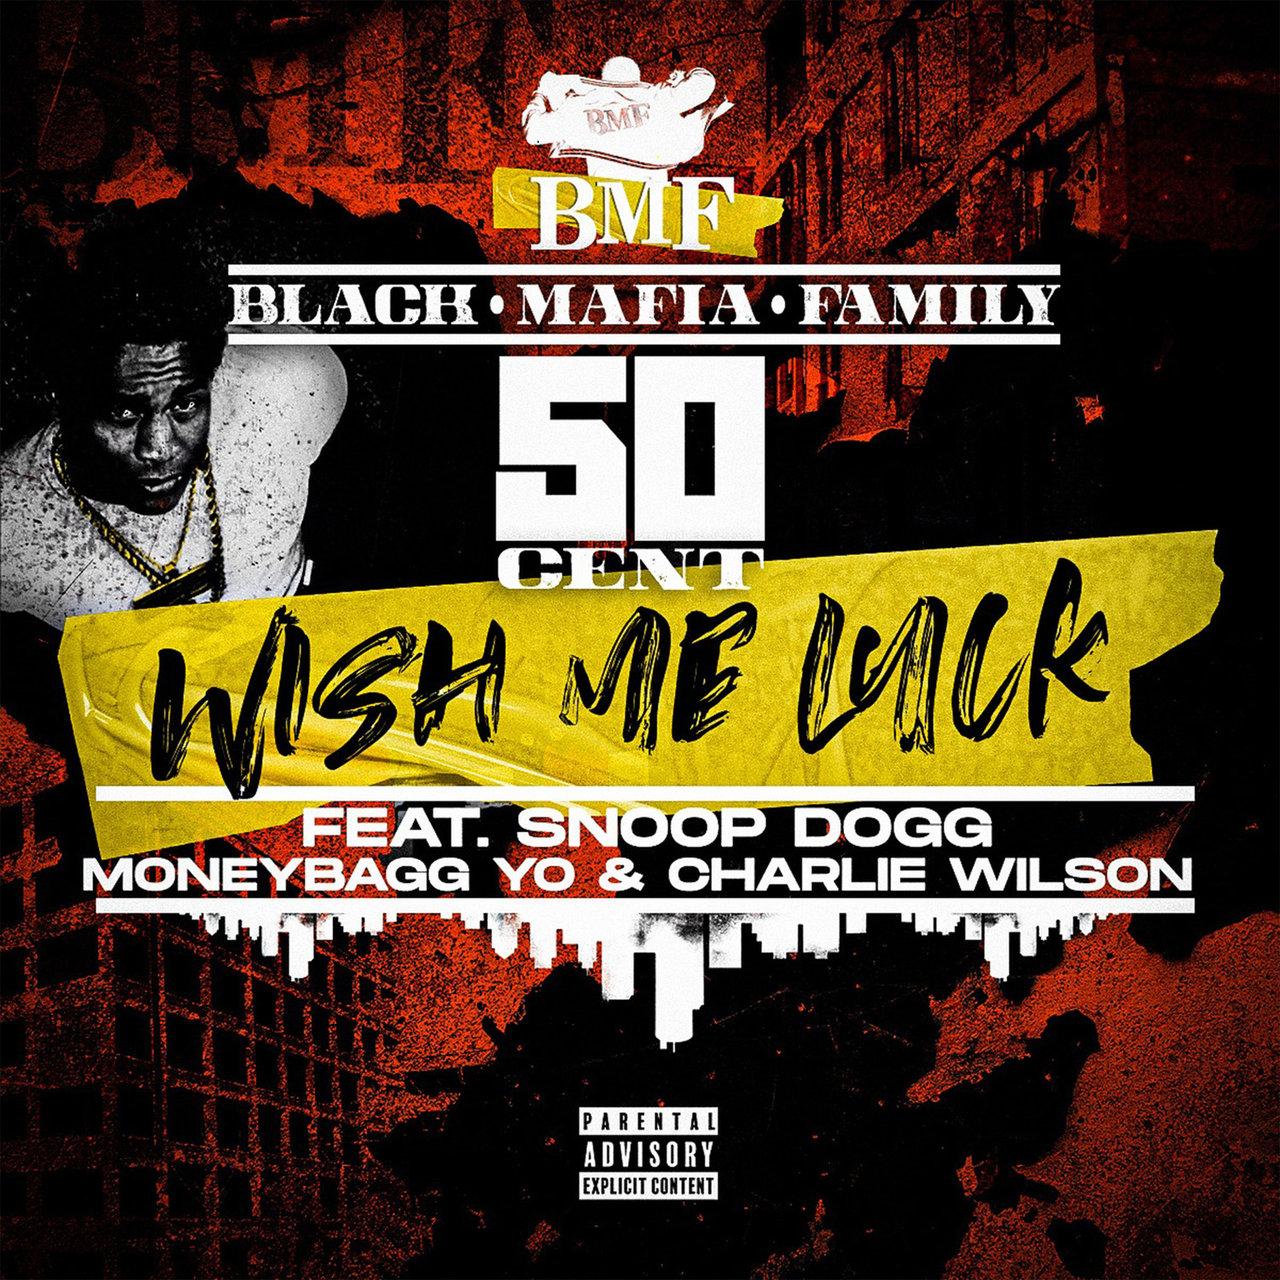 50 Cent - Wish Me Luck Ft. Moneybagg Yo, Snoop Dogg, Charlie Wilson